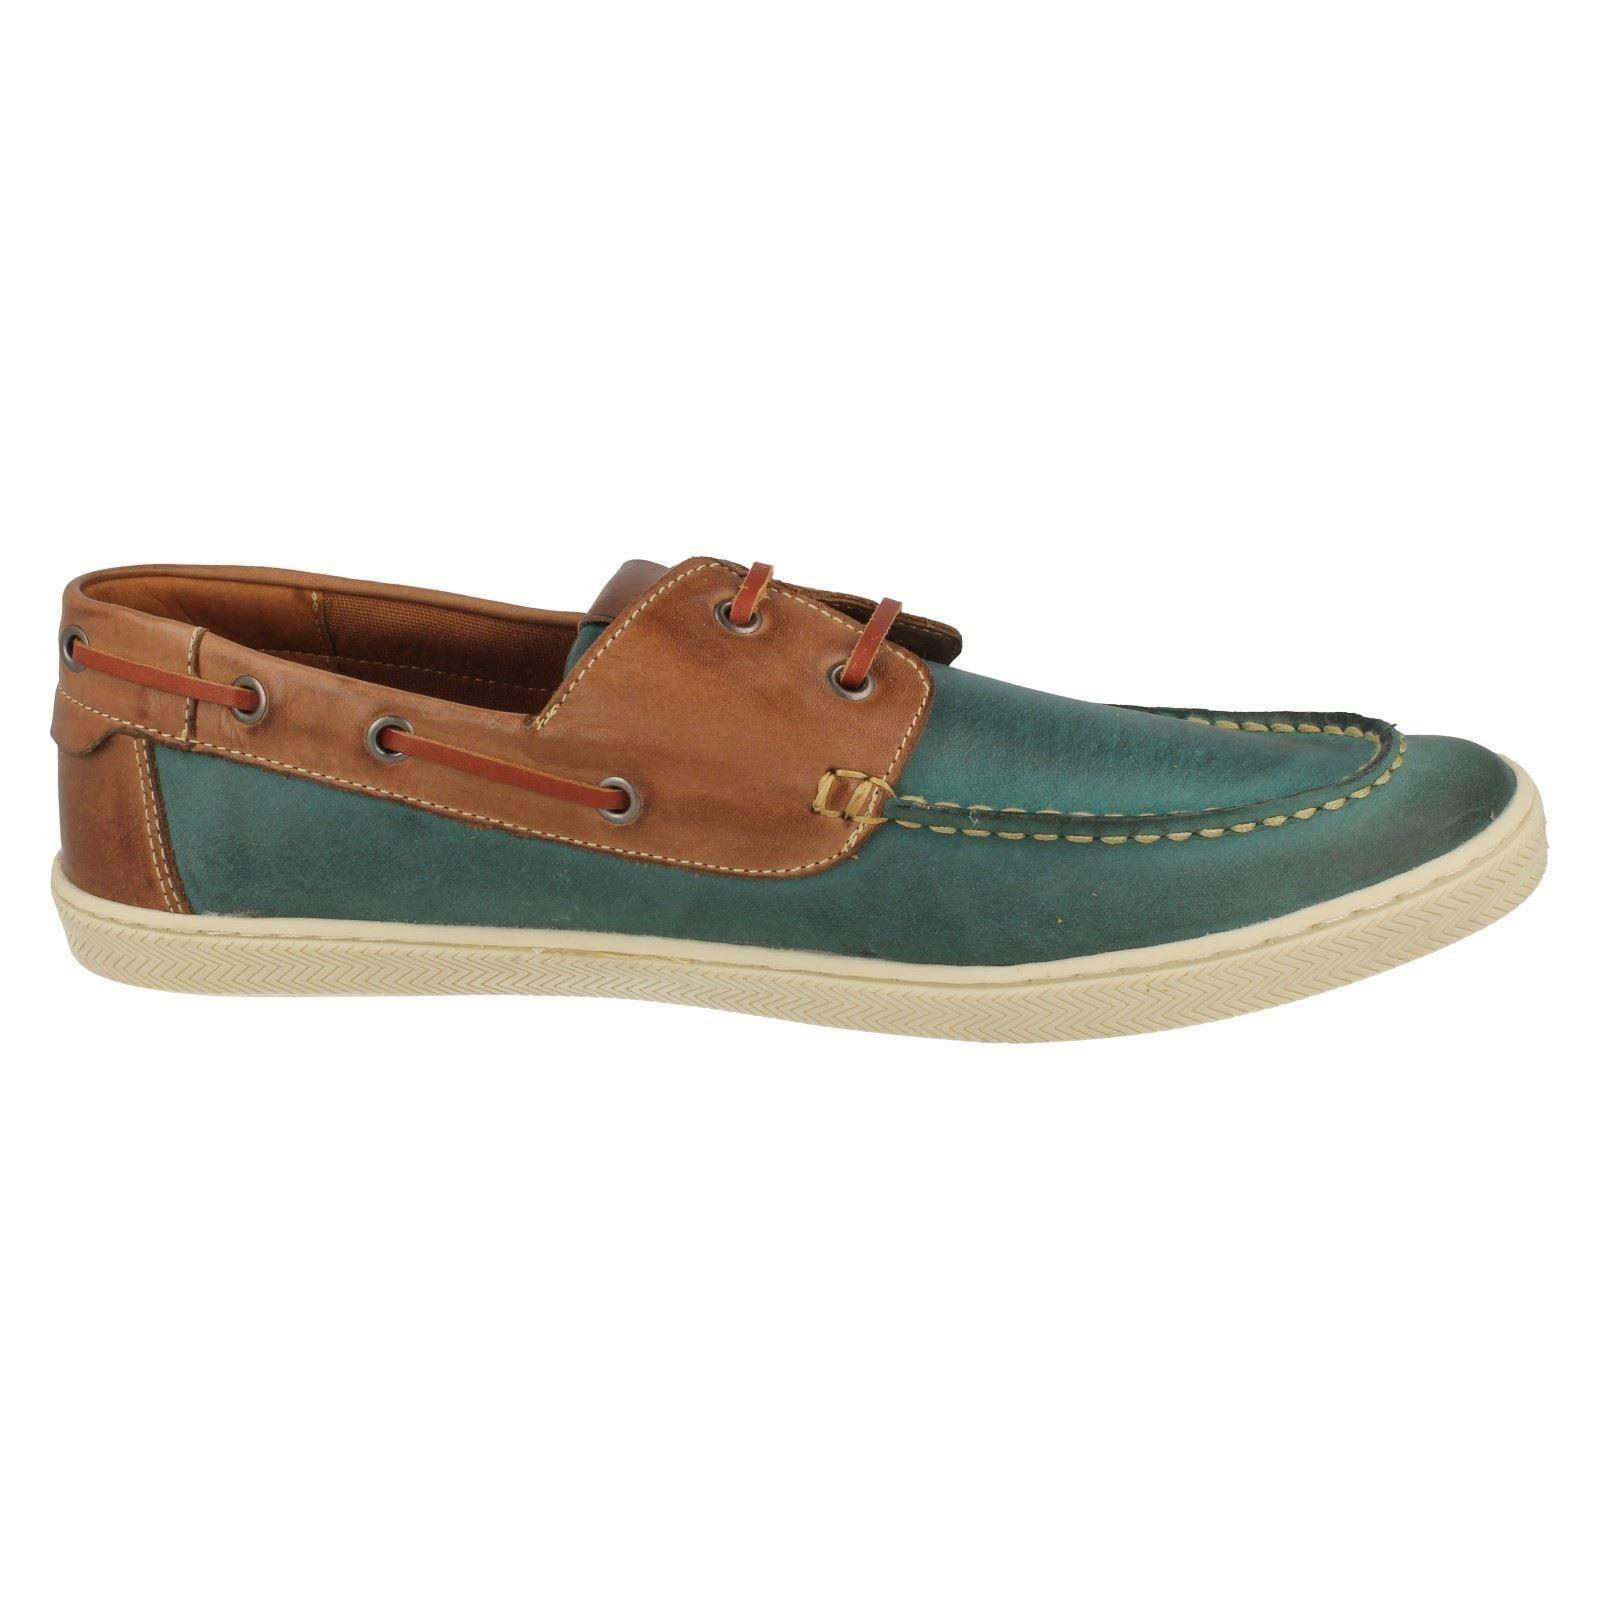 Billig hohe Qualität Mens Anatomic Deck Shoes Lorena